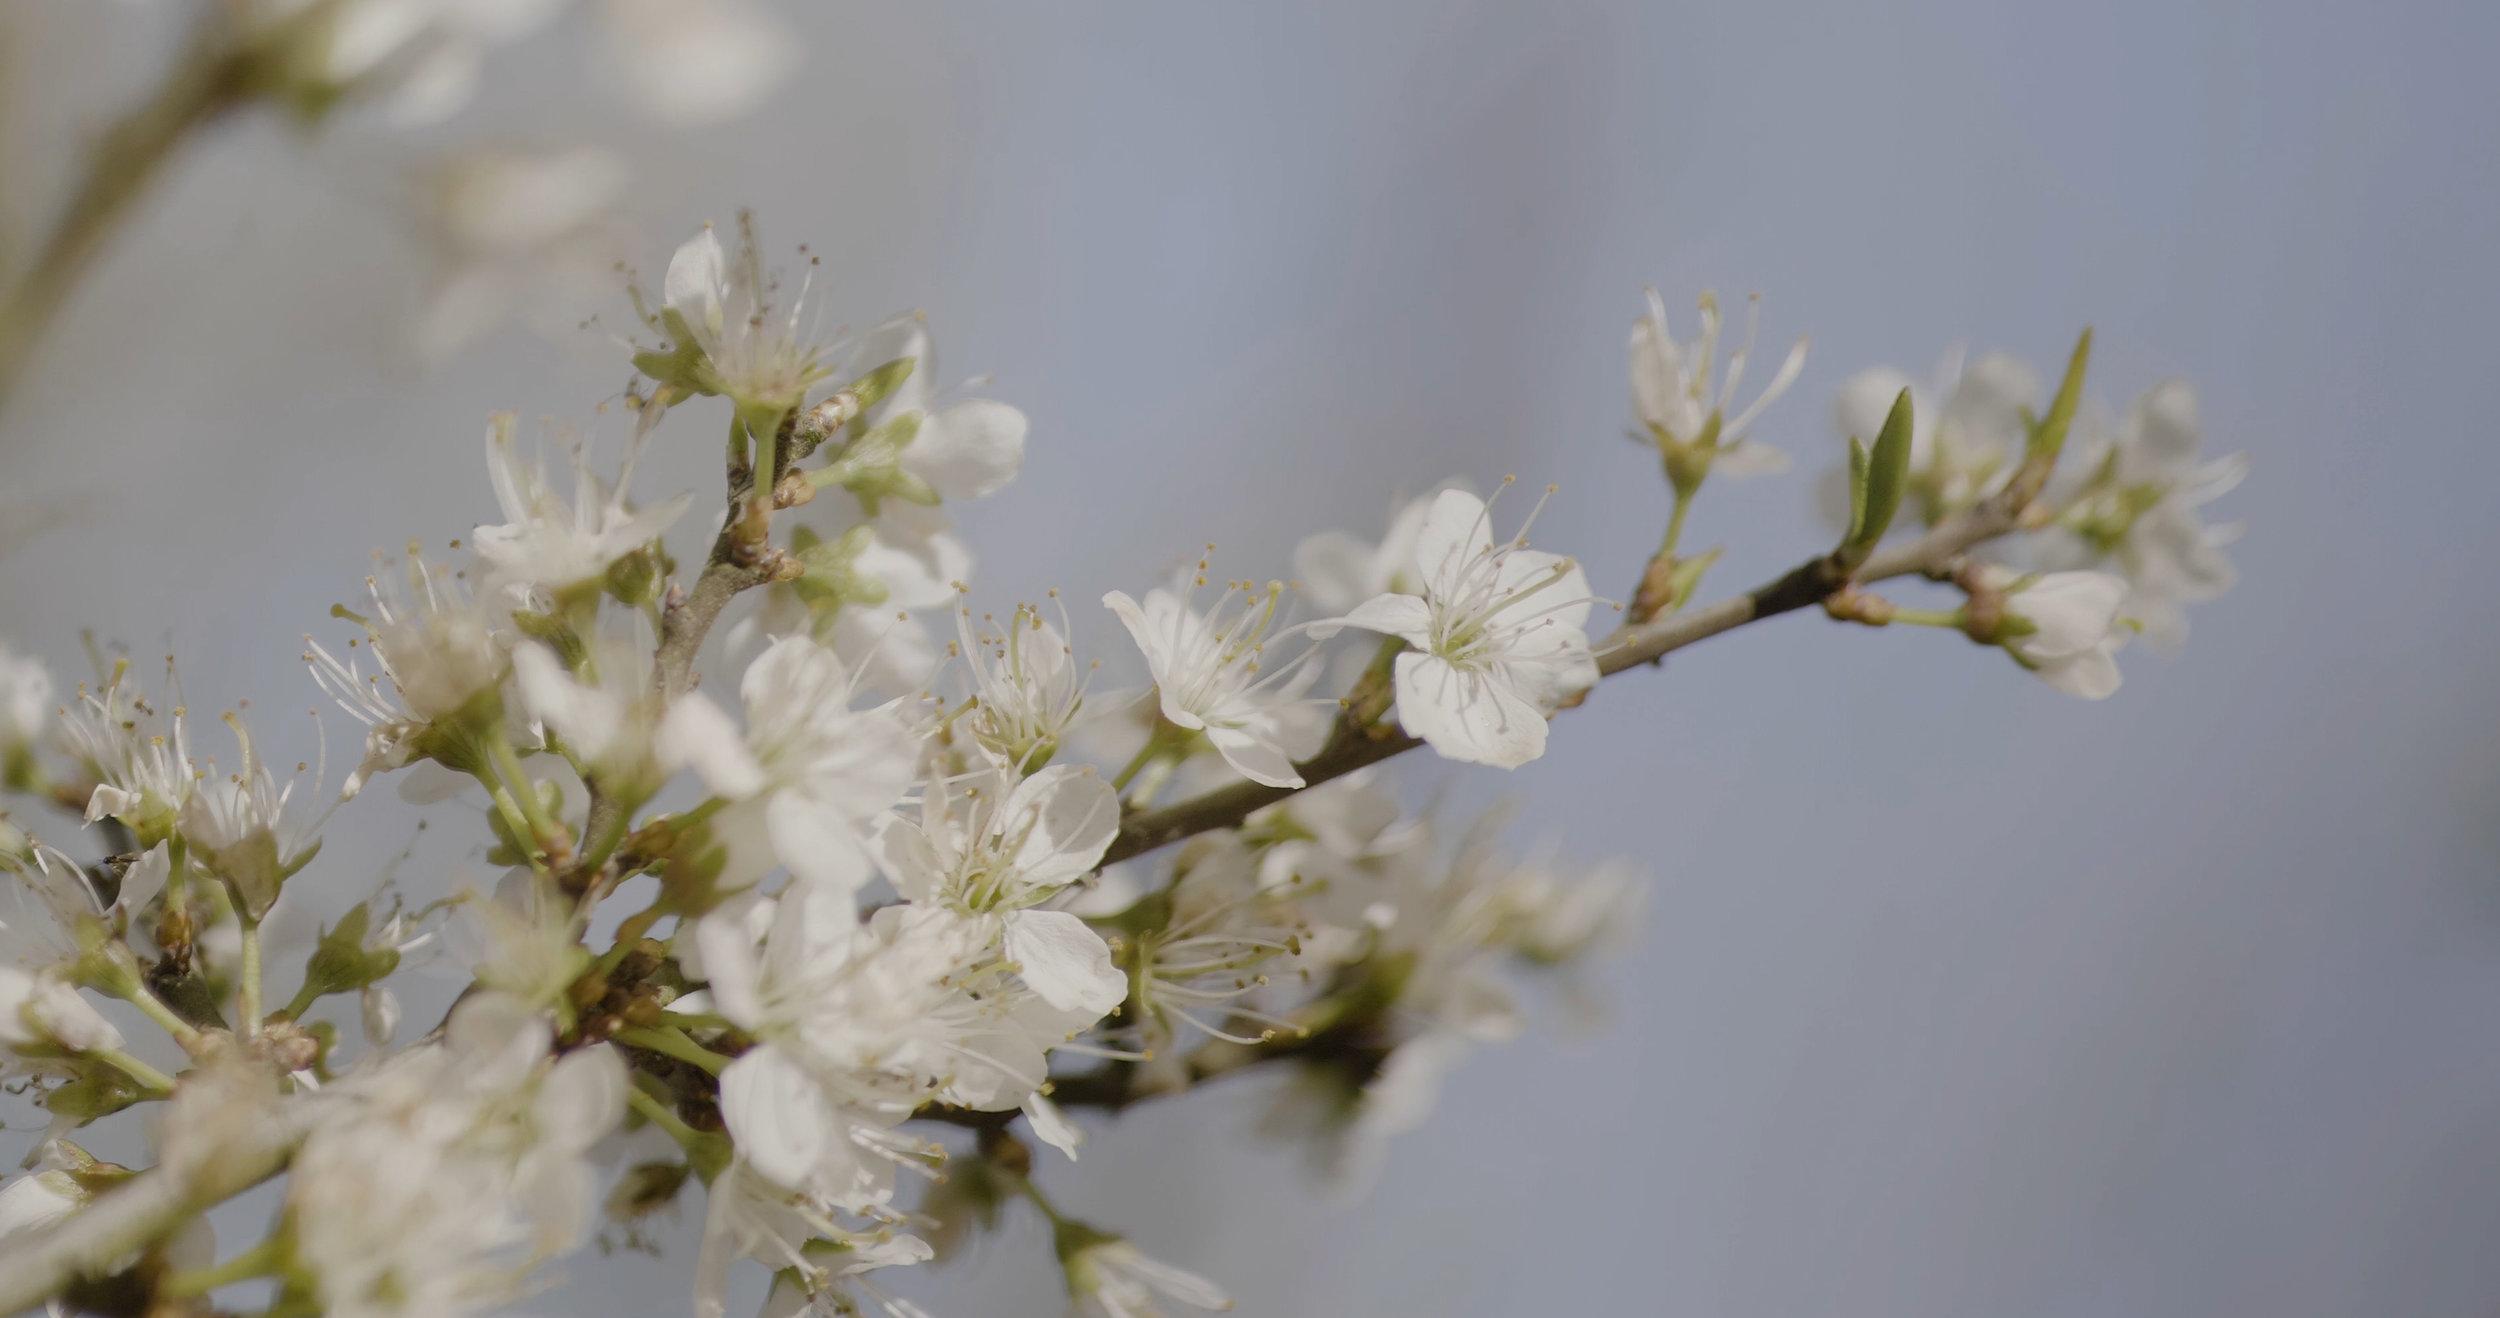 flowerplain.jpg